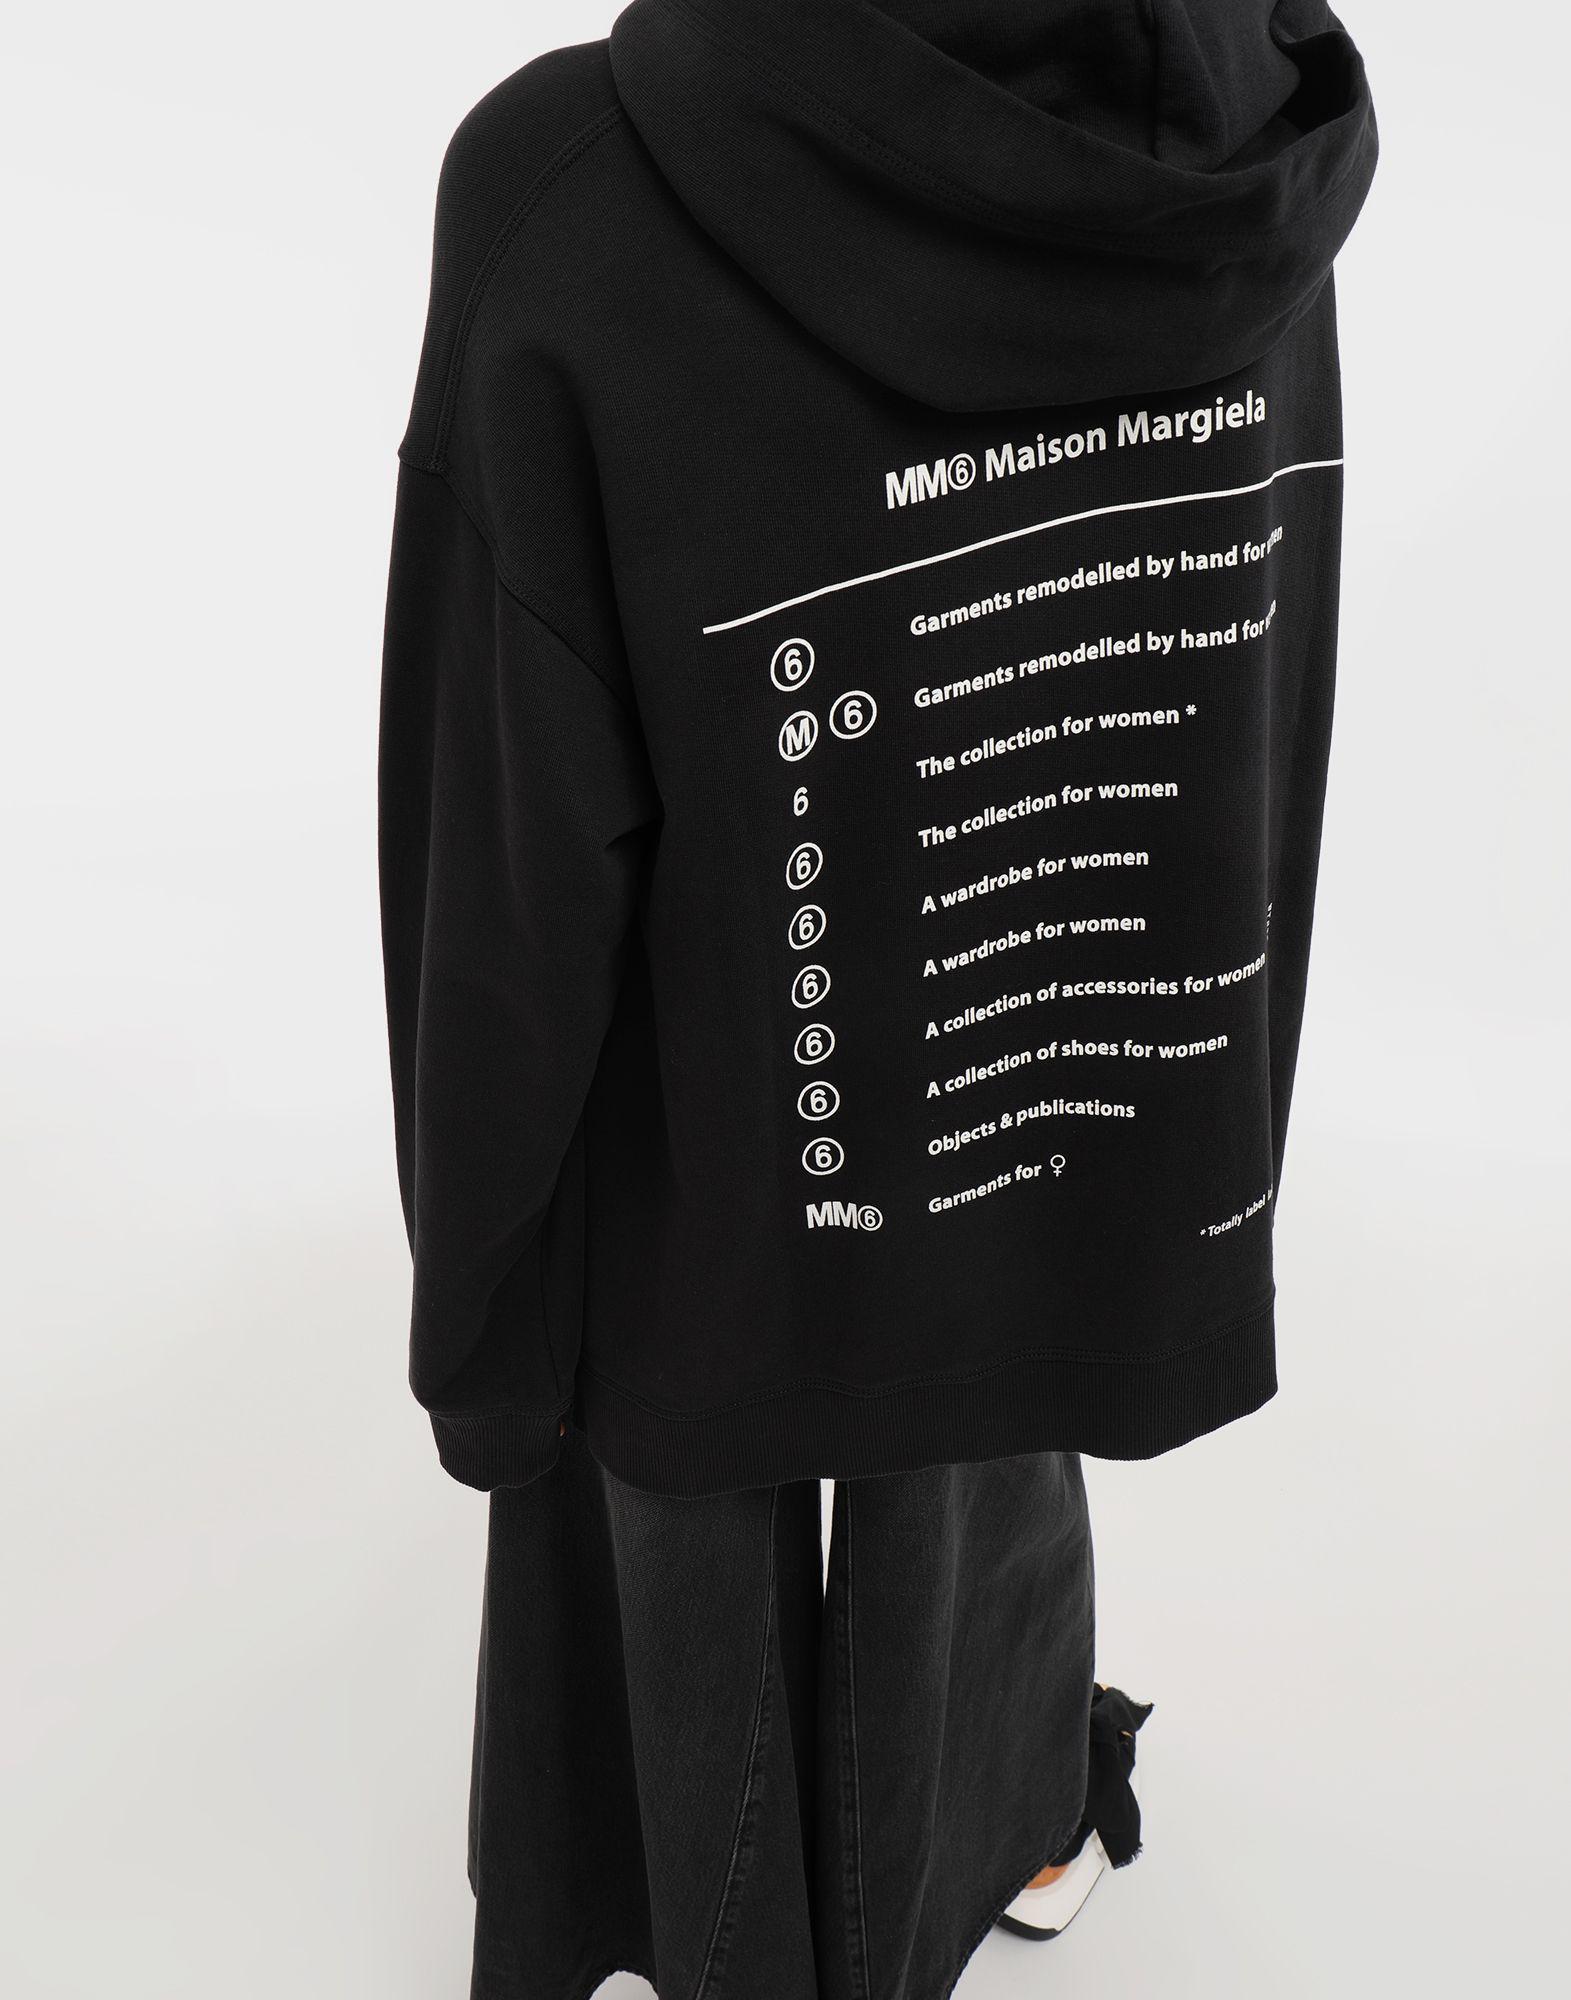 e195c177b2 Lyst - MM6 by Maison Martin Margiela Logo-print Hooded Sweatshirt in Black